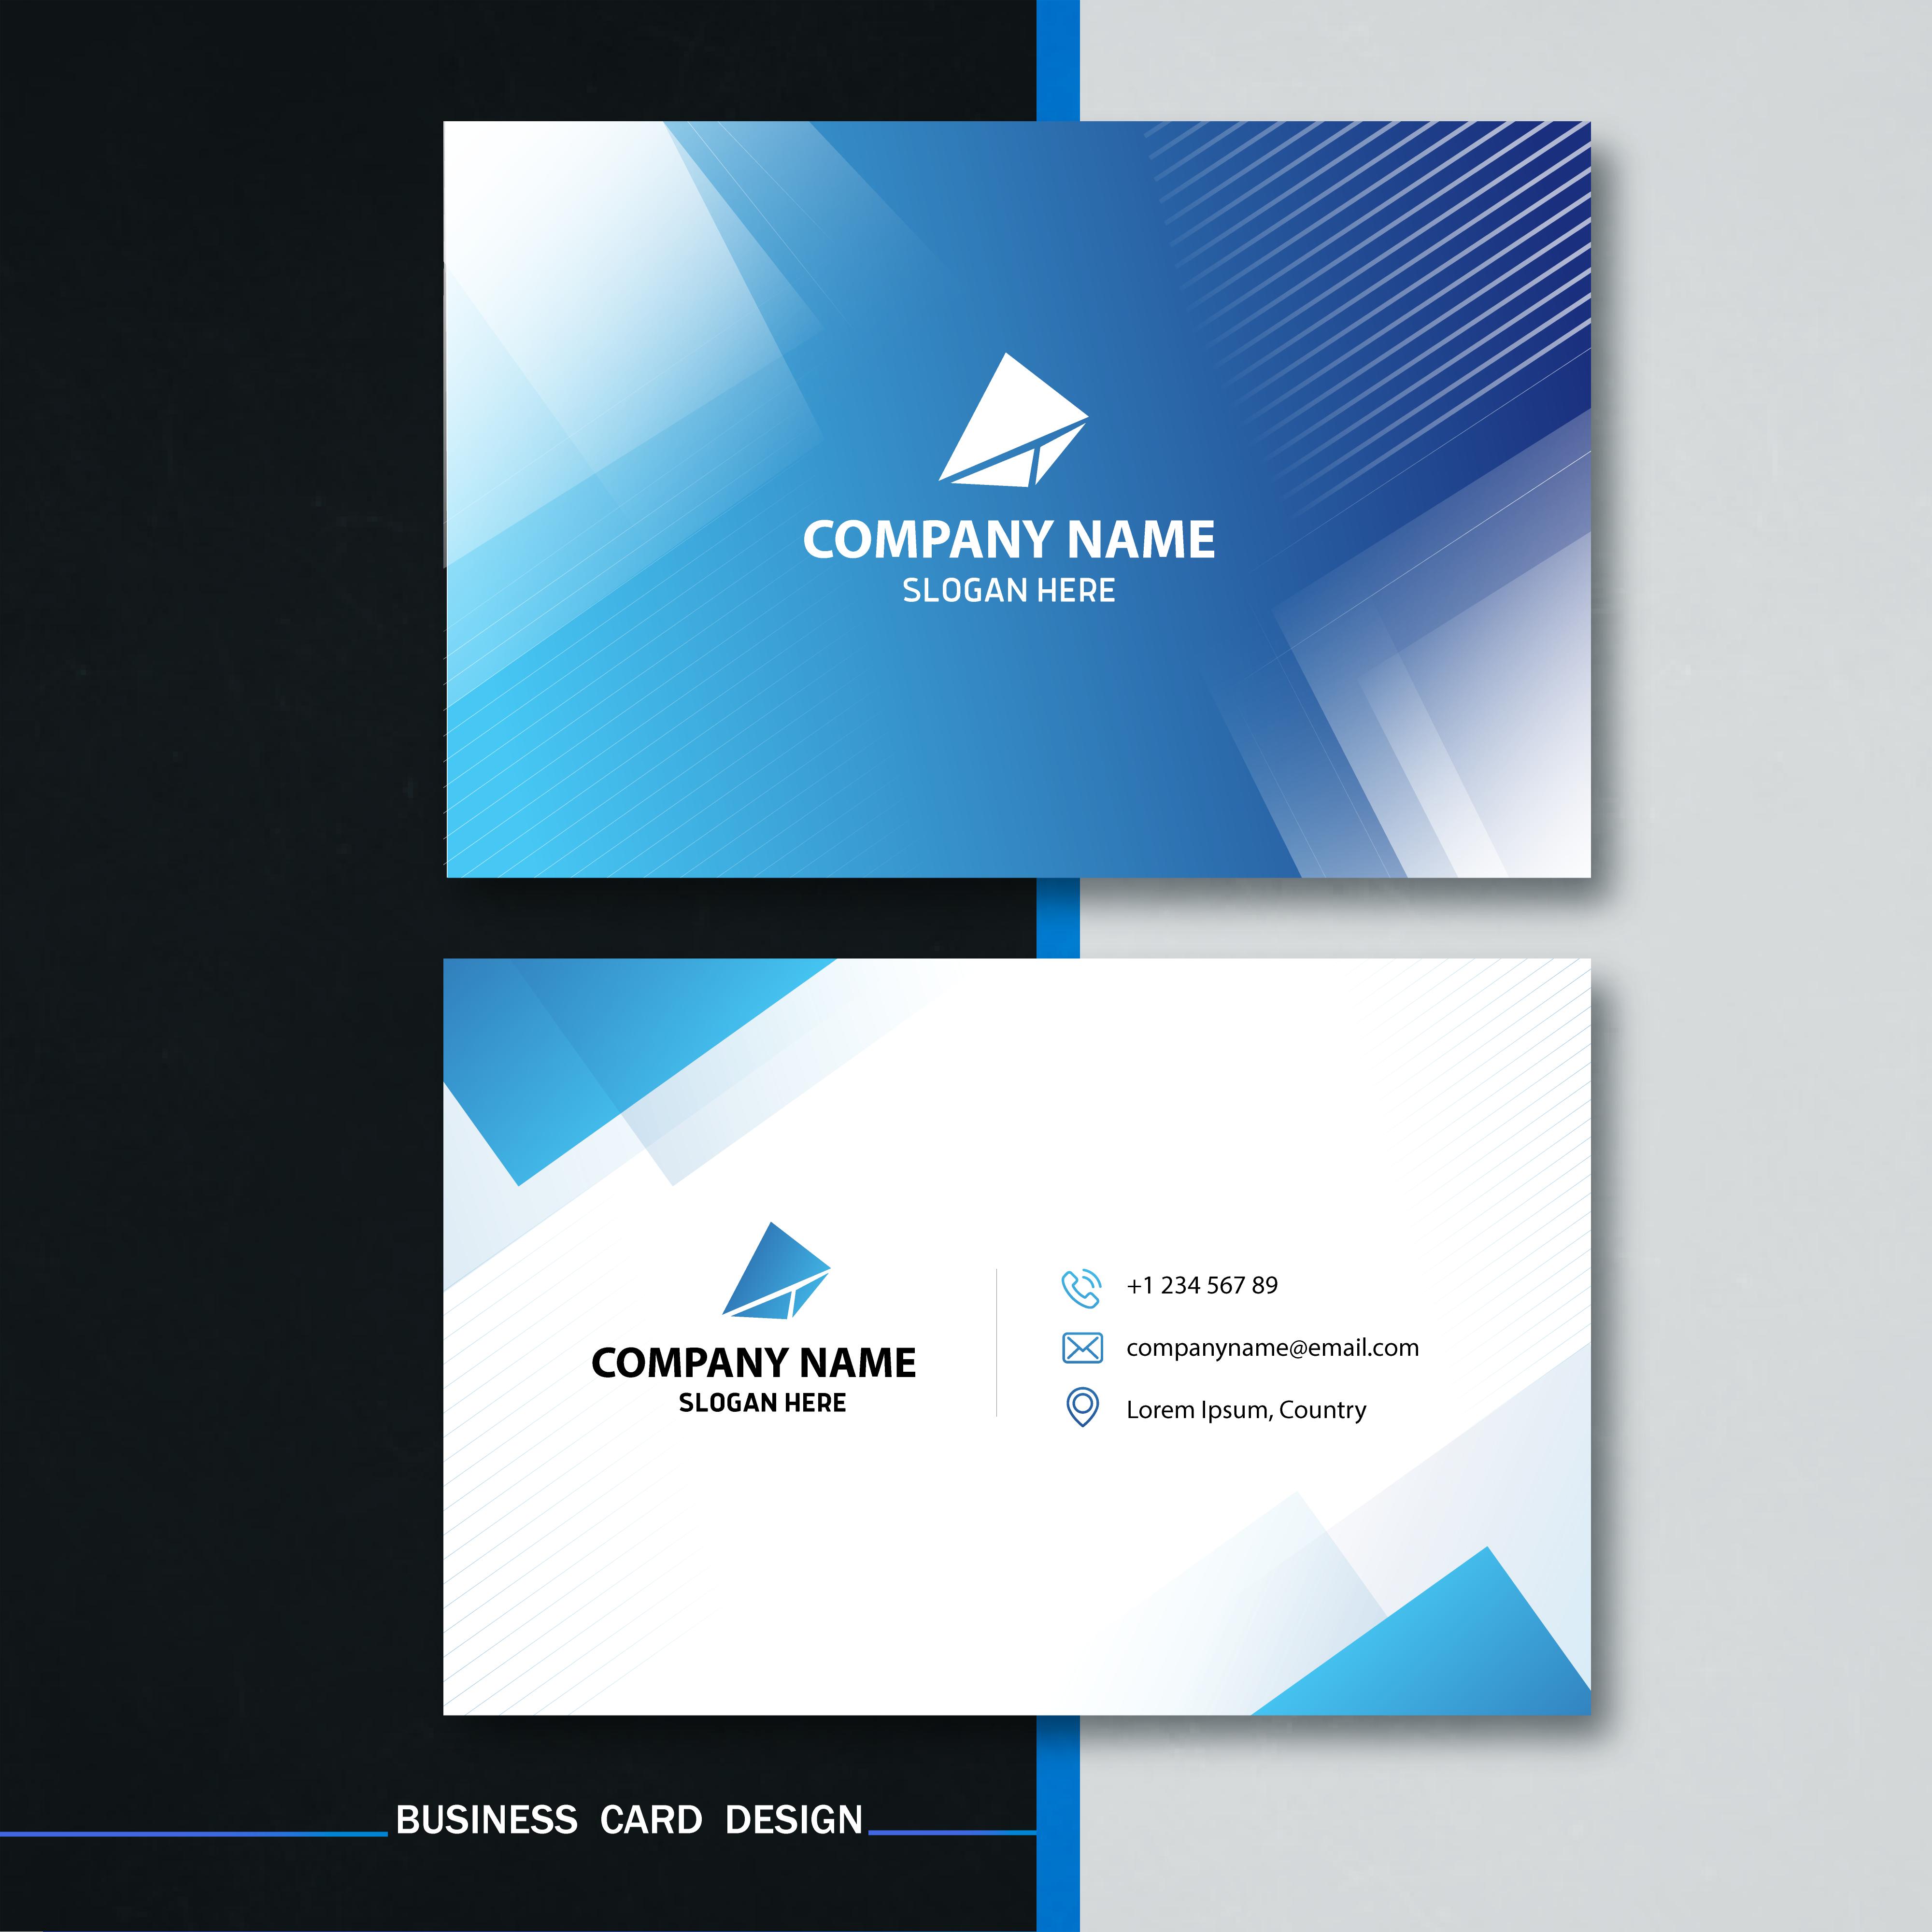 Business Card Business Card Design Card Design Cards